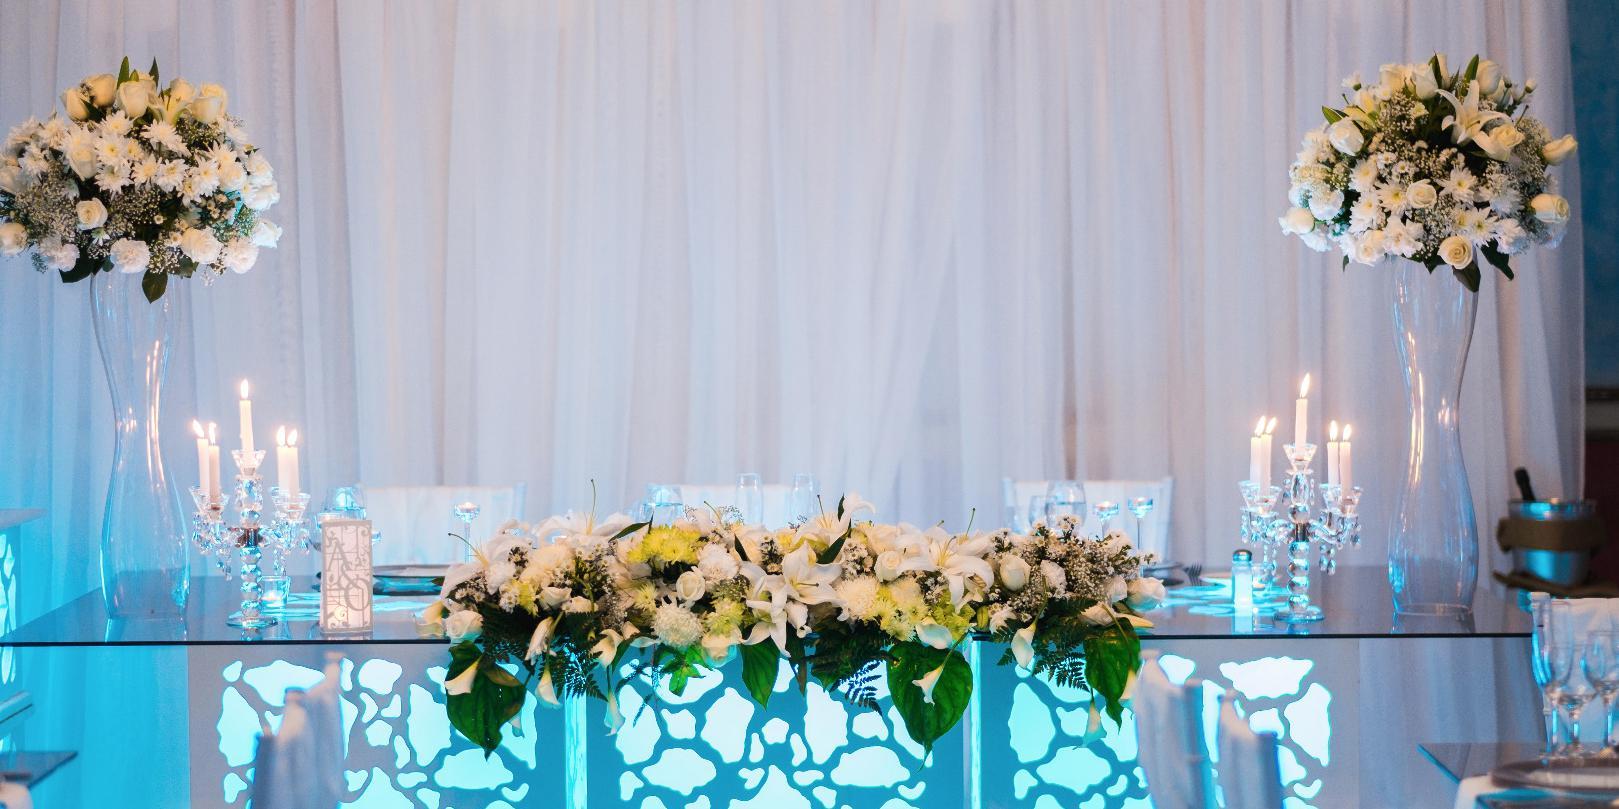 bodas-sin-clasificar-sin-tema-cuba-30851.jpg